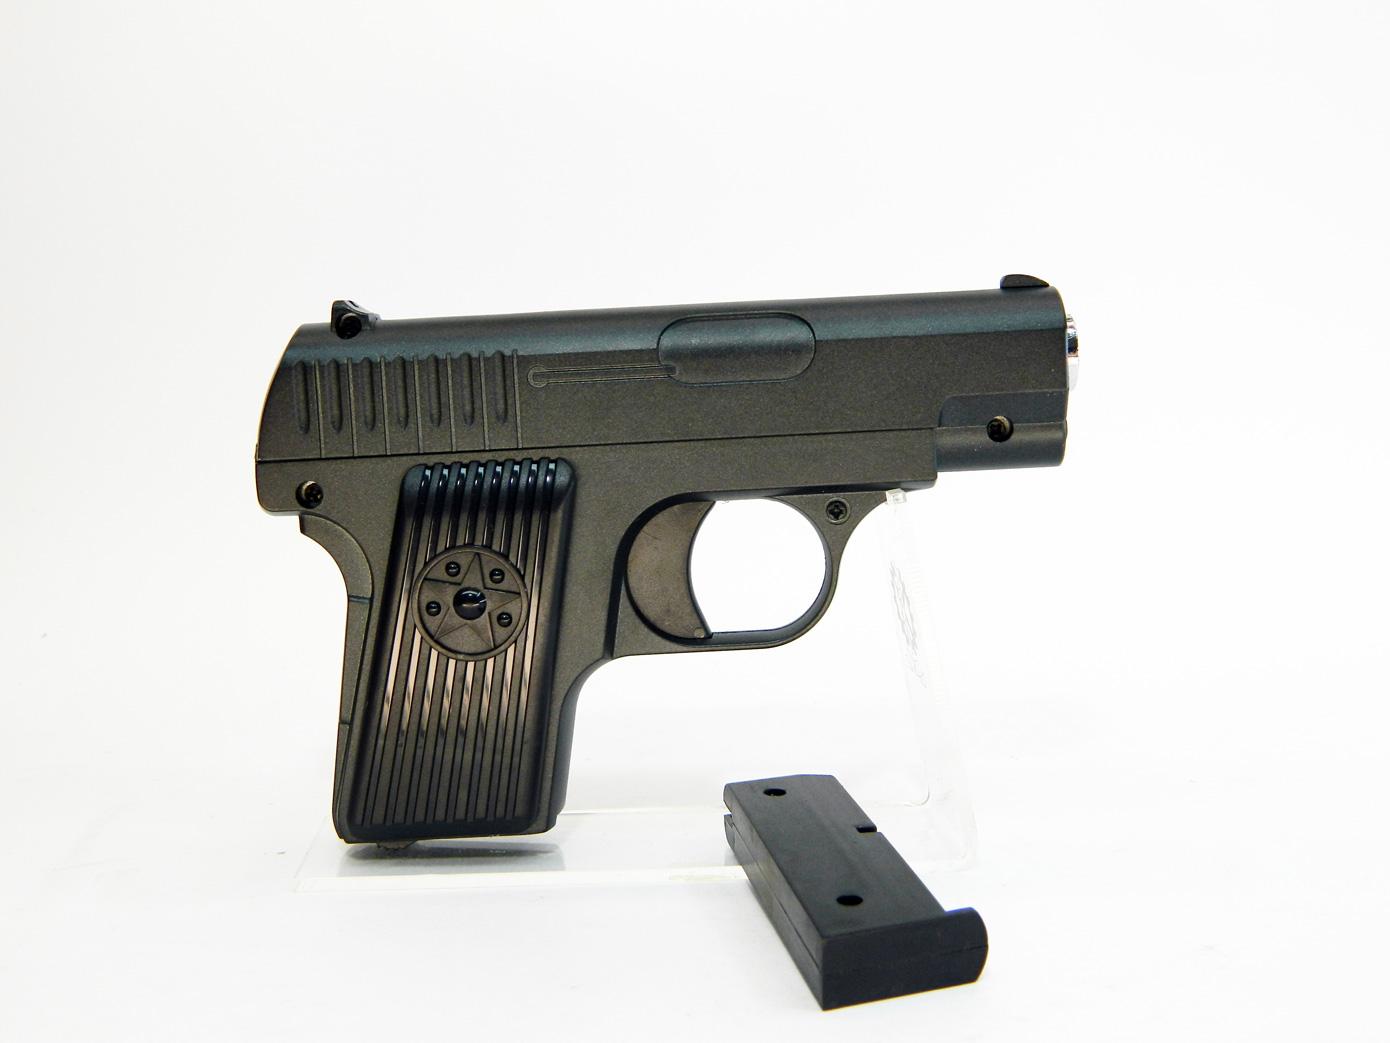 Пистолет ТТ мини изображение 2